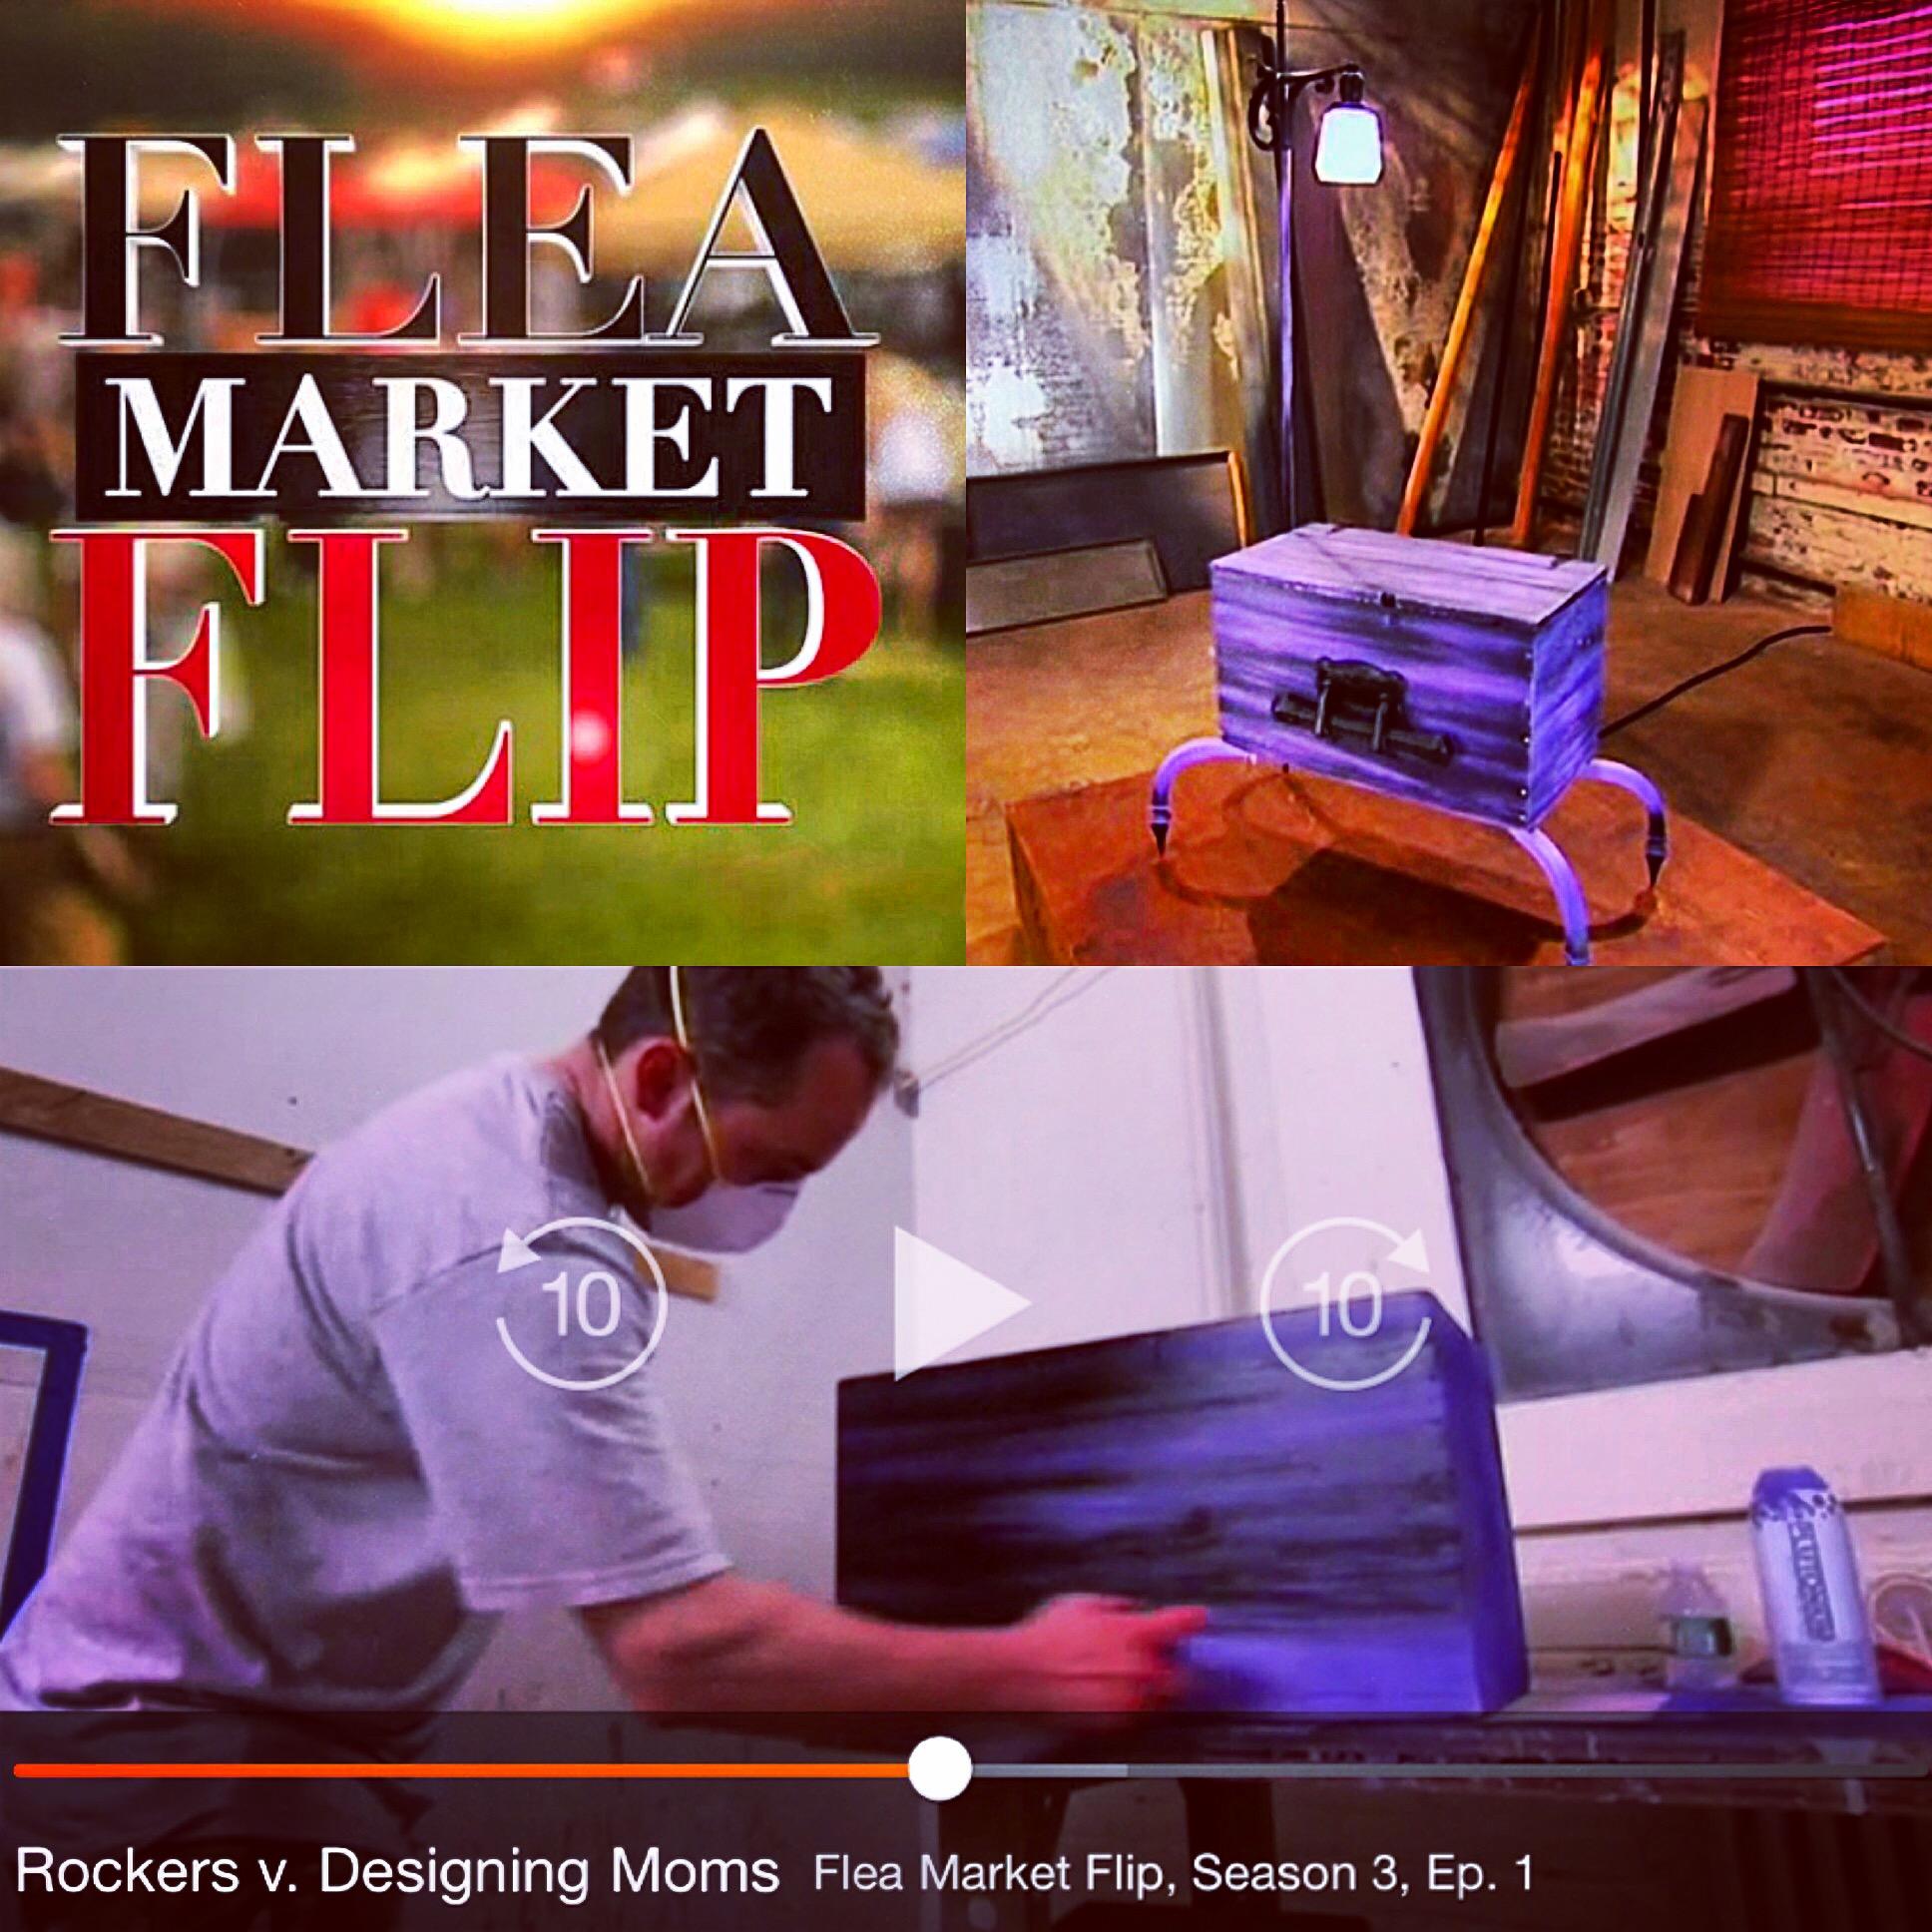 Flea Market Flip! – Plutonium™ Paint